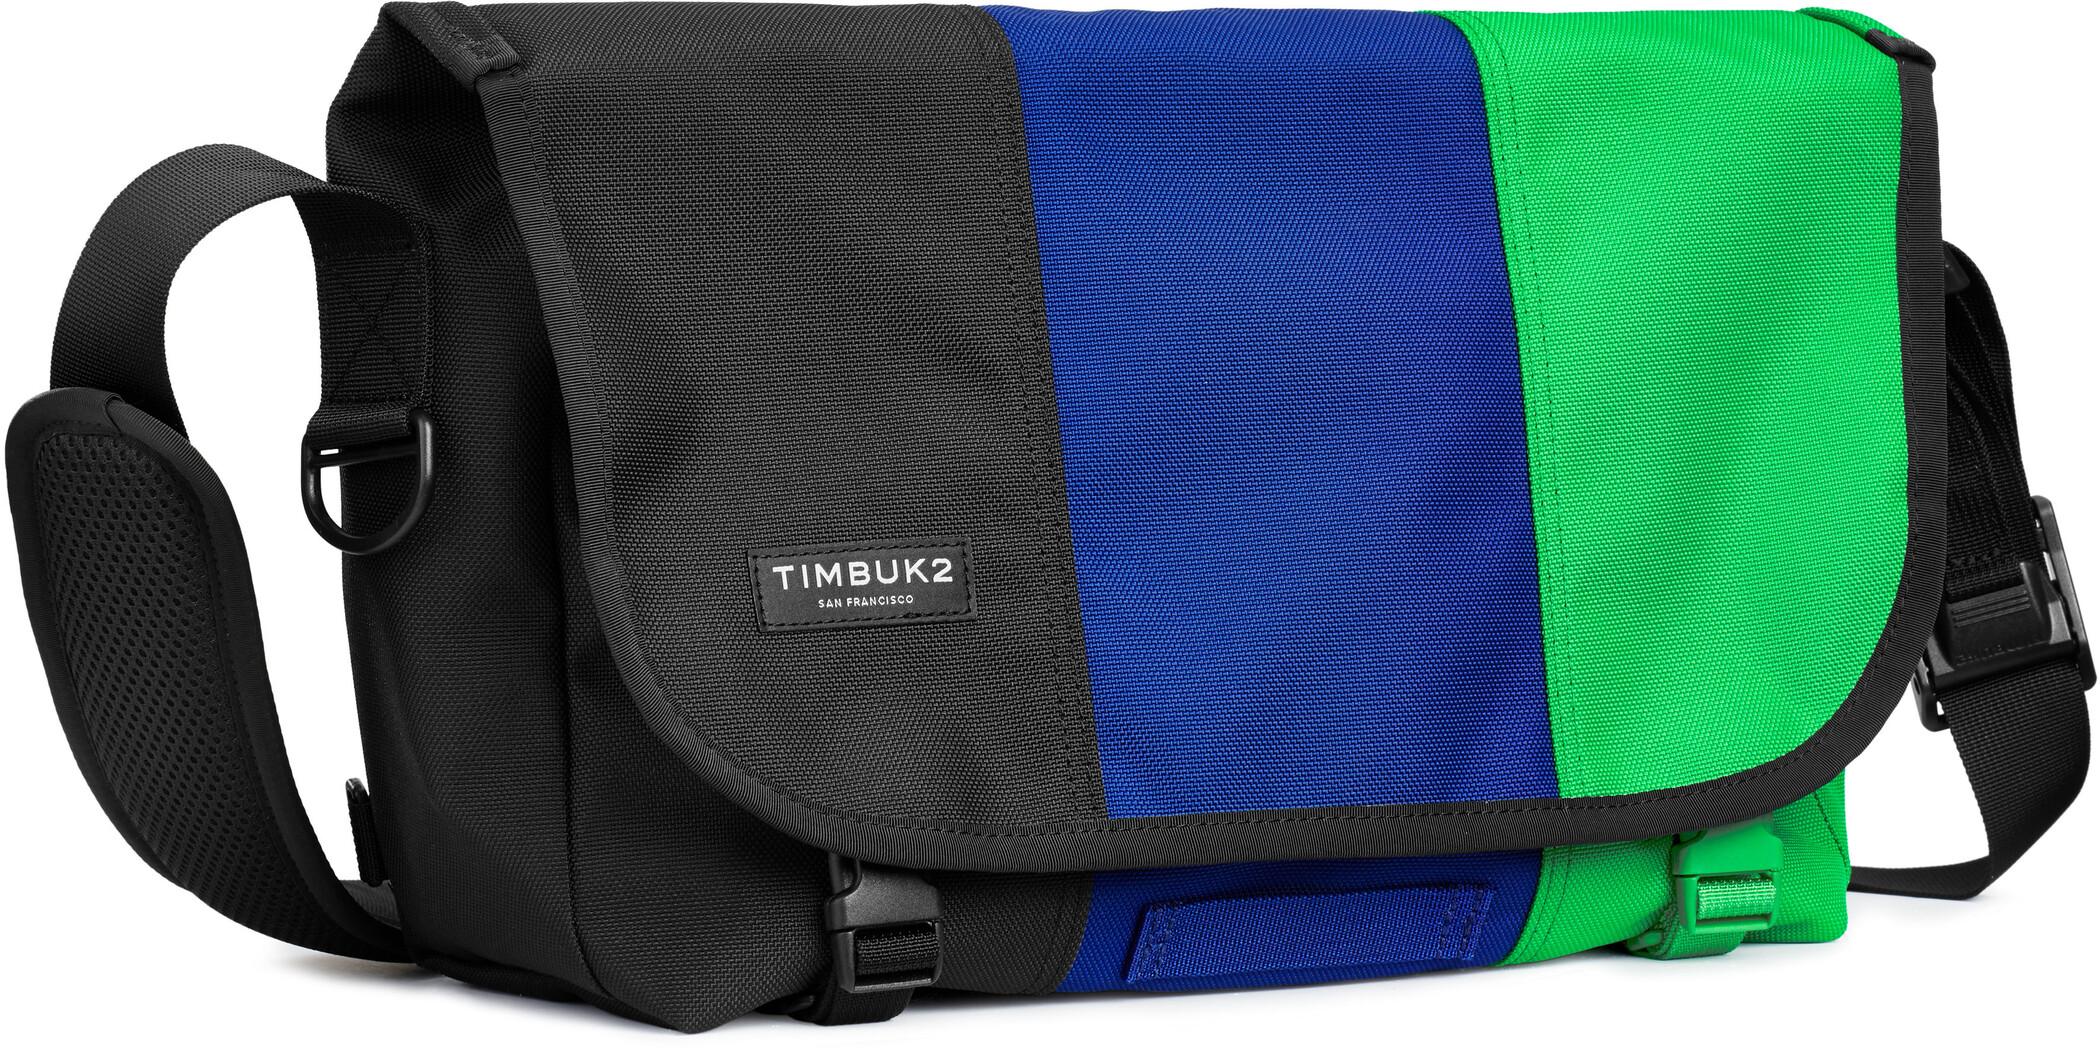 Timbuk2 Classic Messenger Tres Colores Taske S, grove (2019) | Travel bags